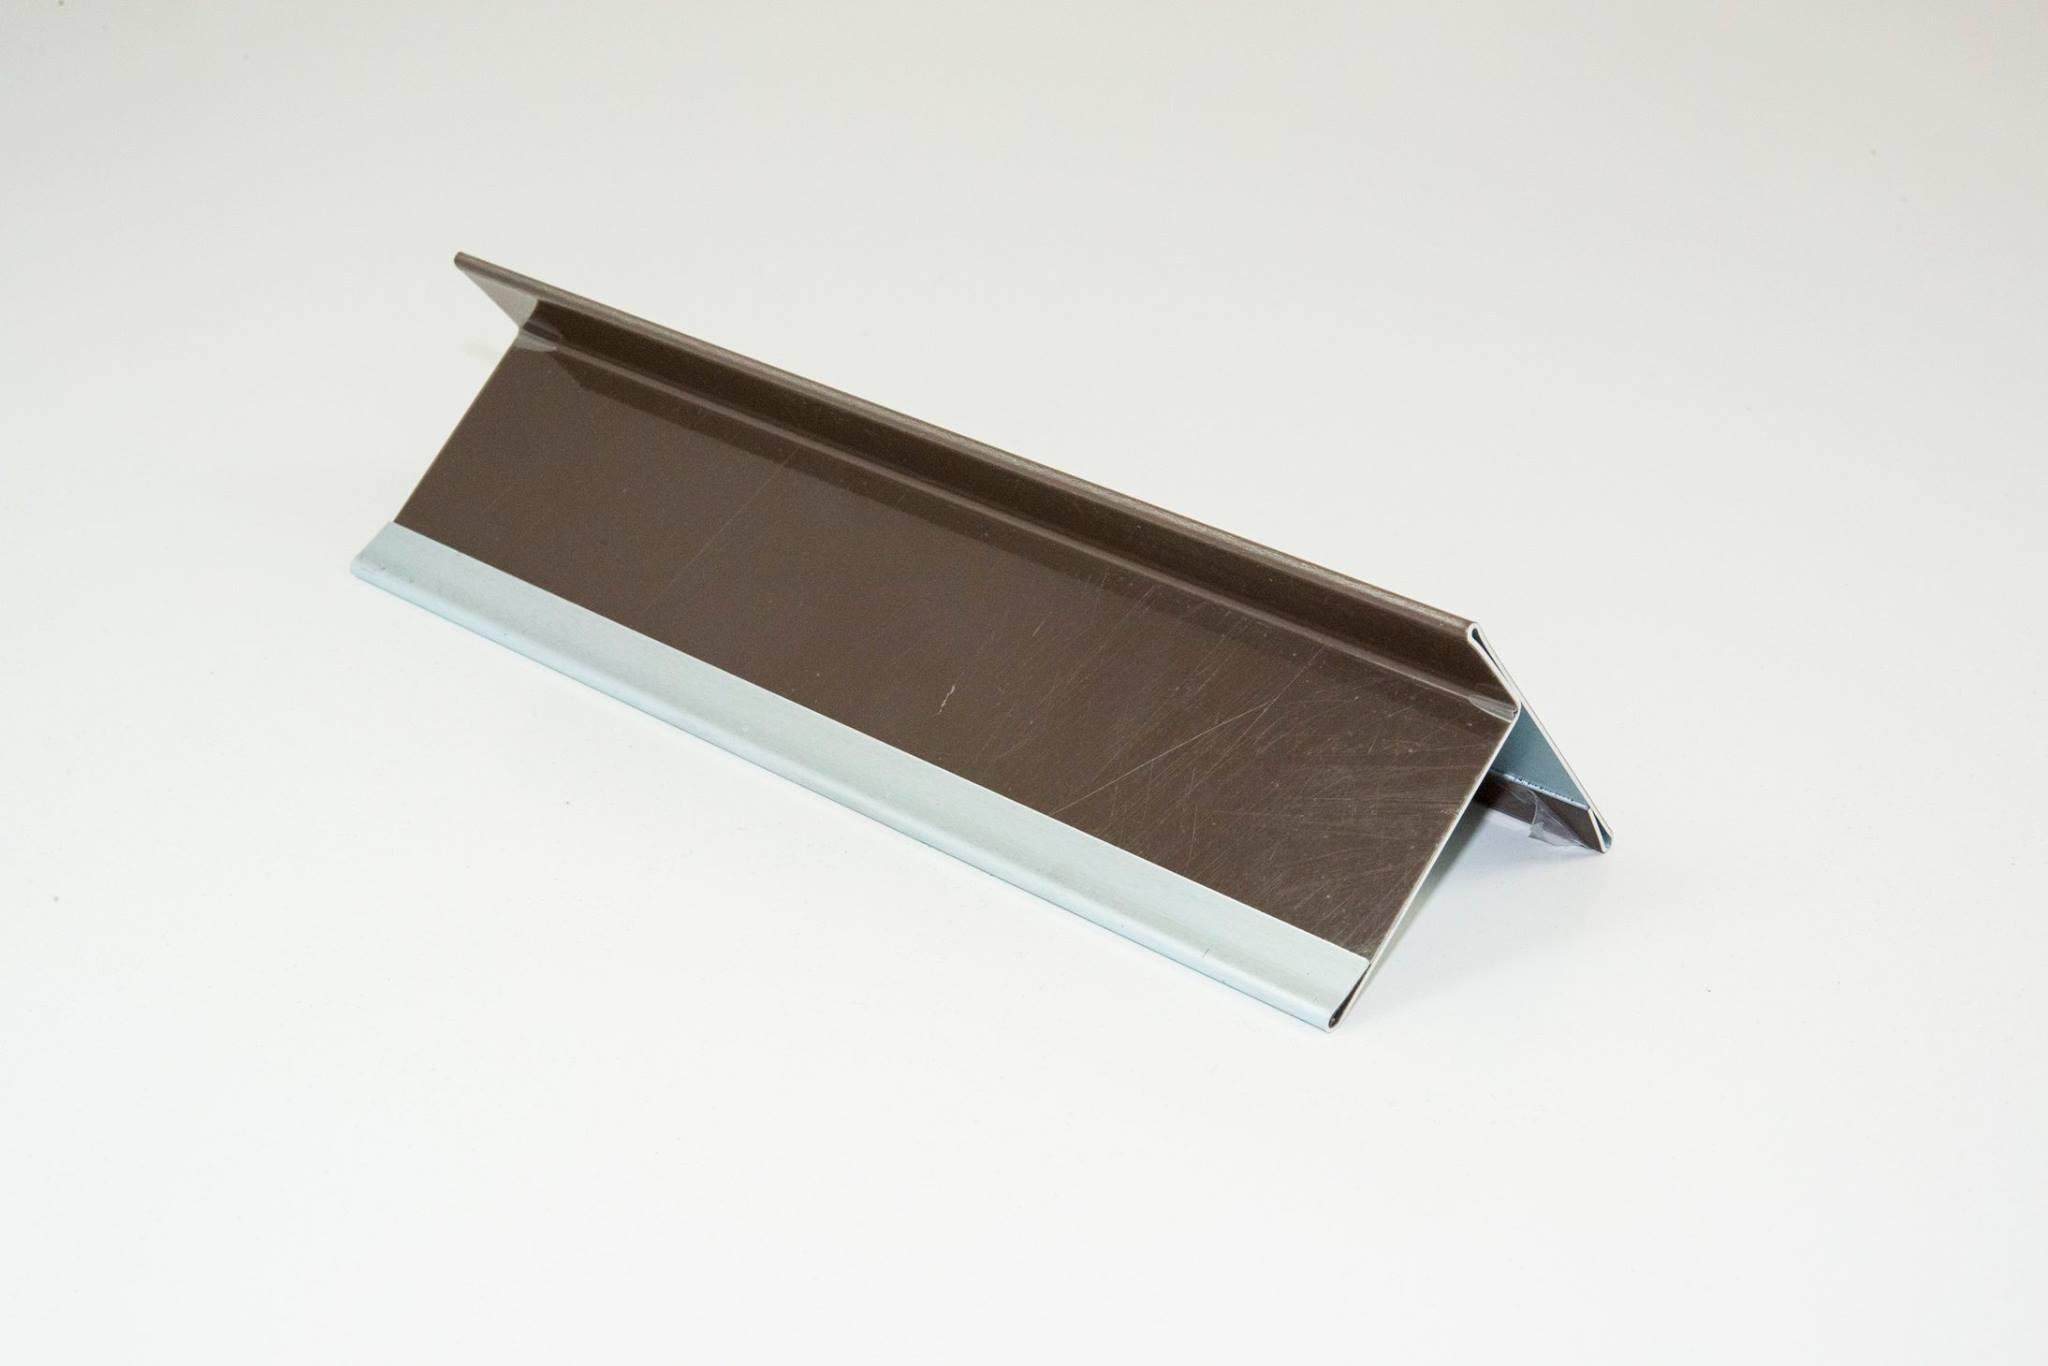 Braunes Aluminiumblech mit Schutzfolie